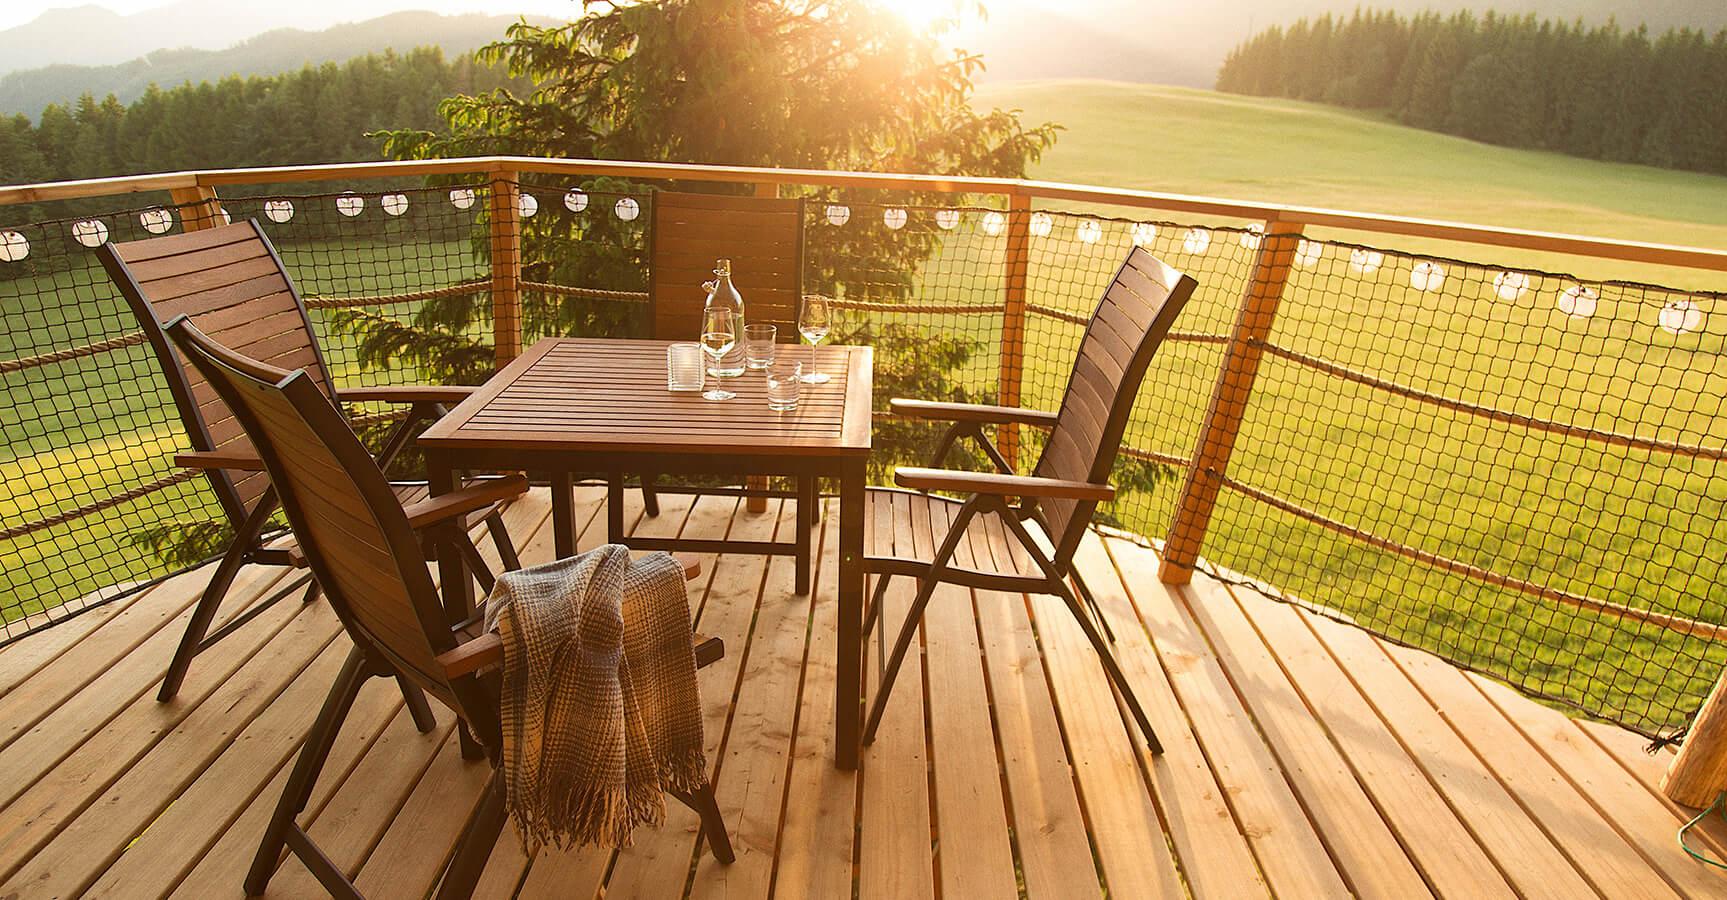 terasa-stol-stolicky-osvetlenie-les-priroda-vino-pohare